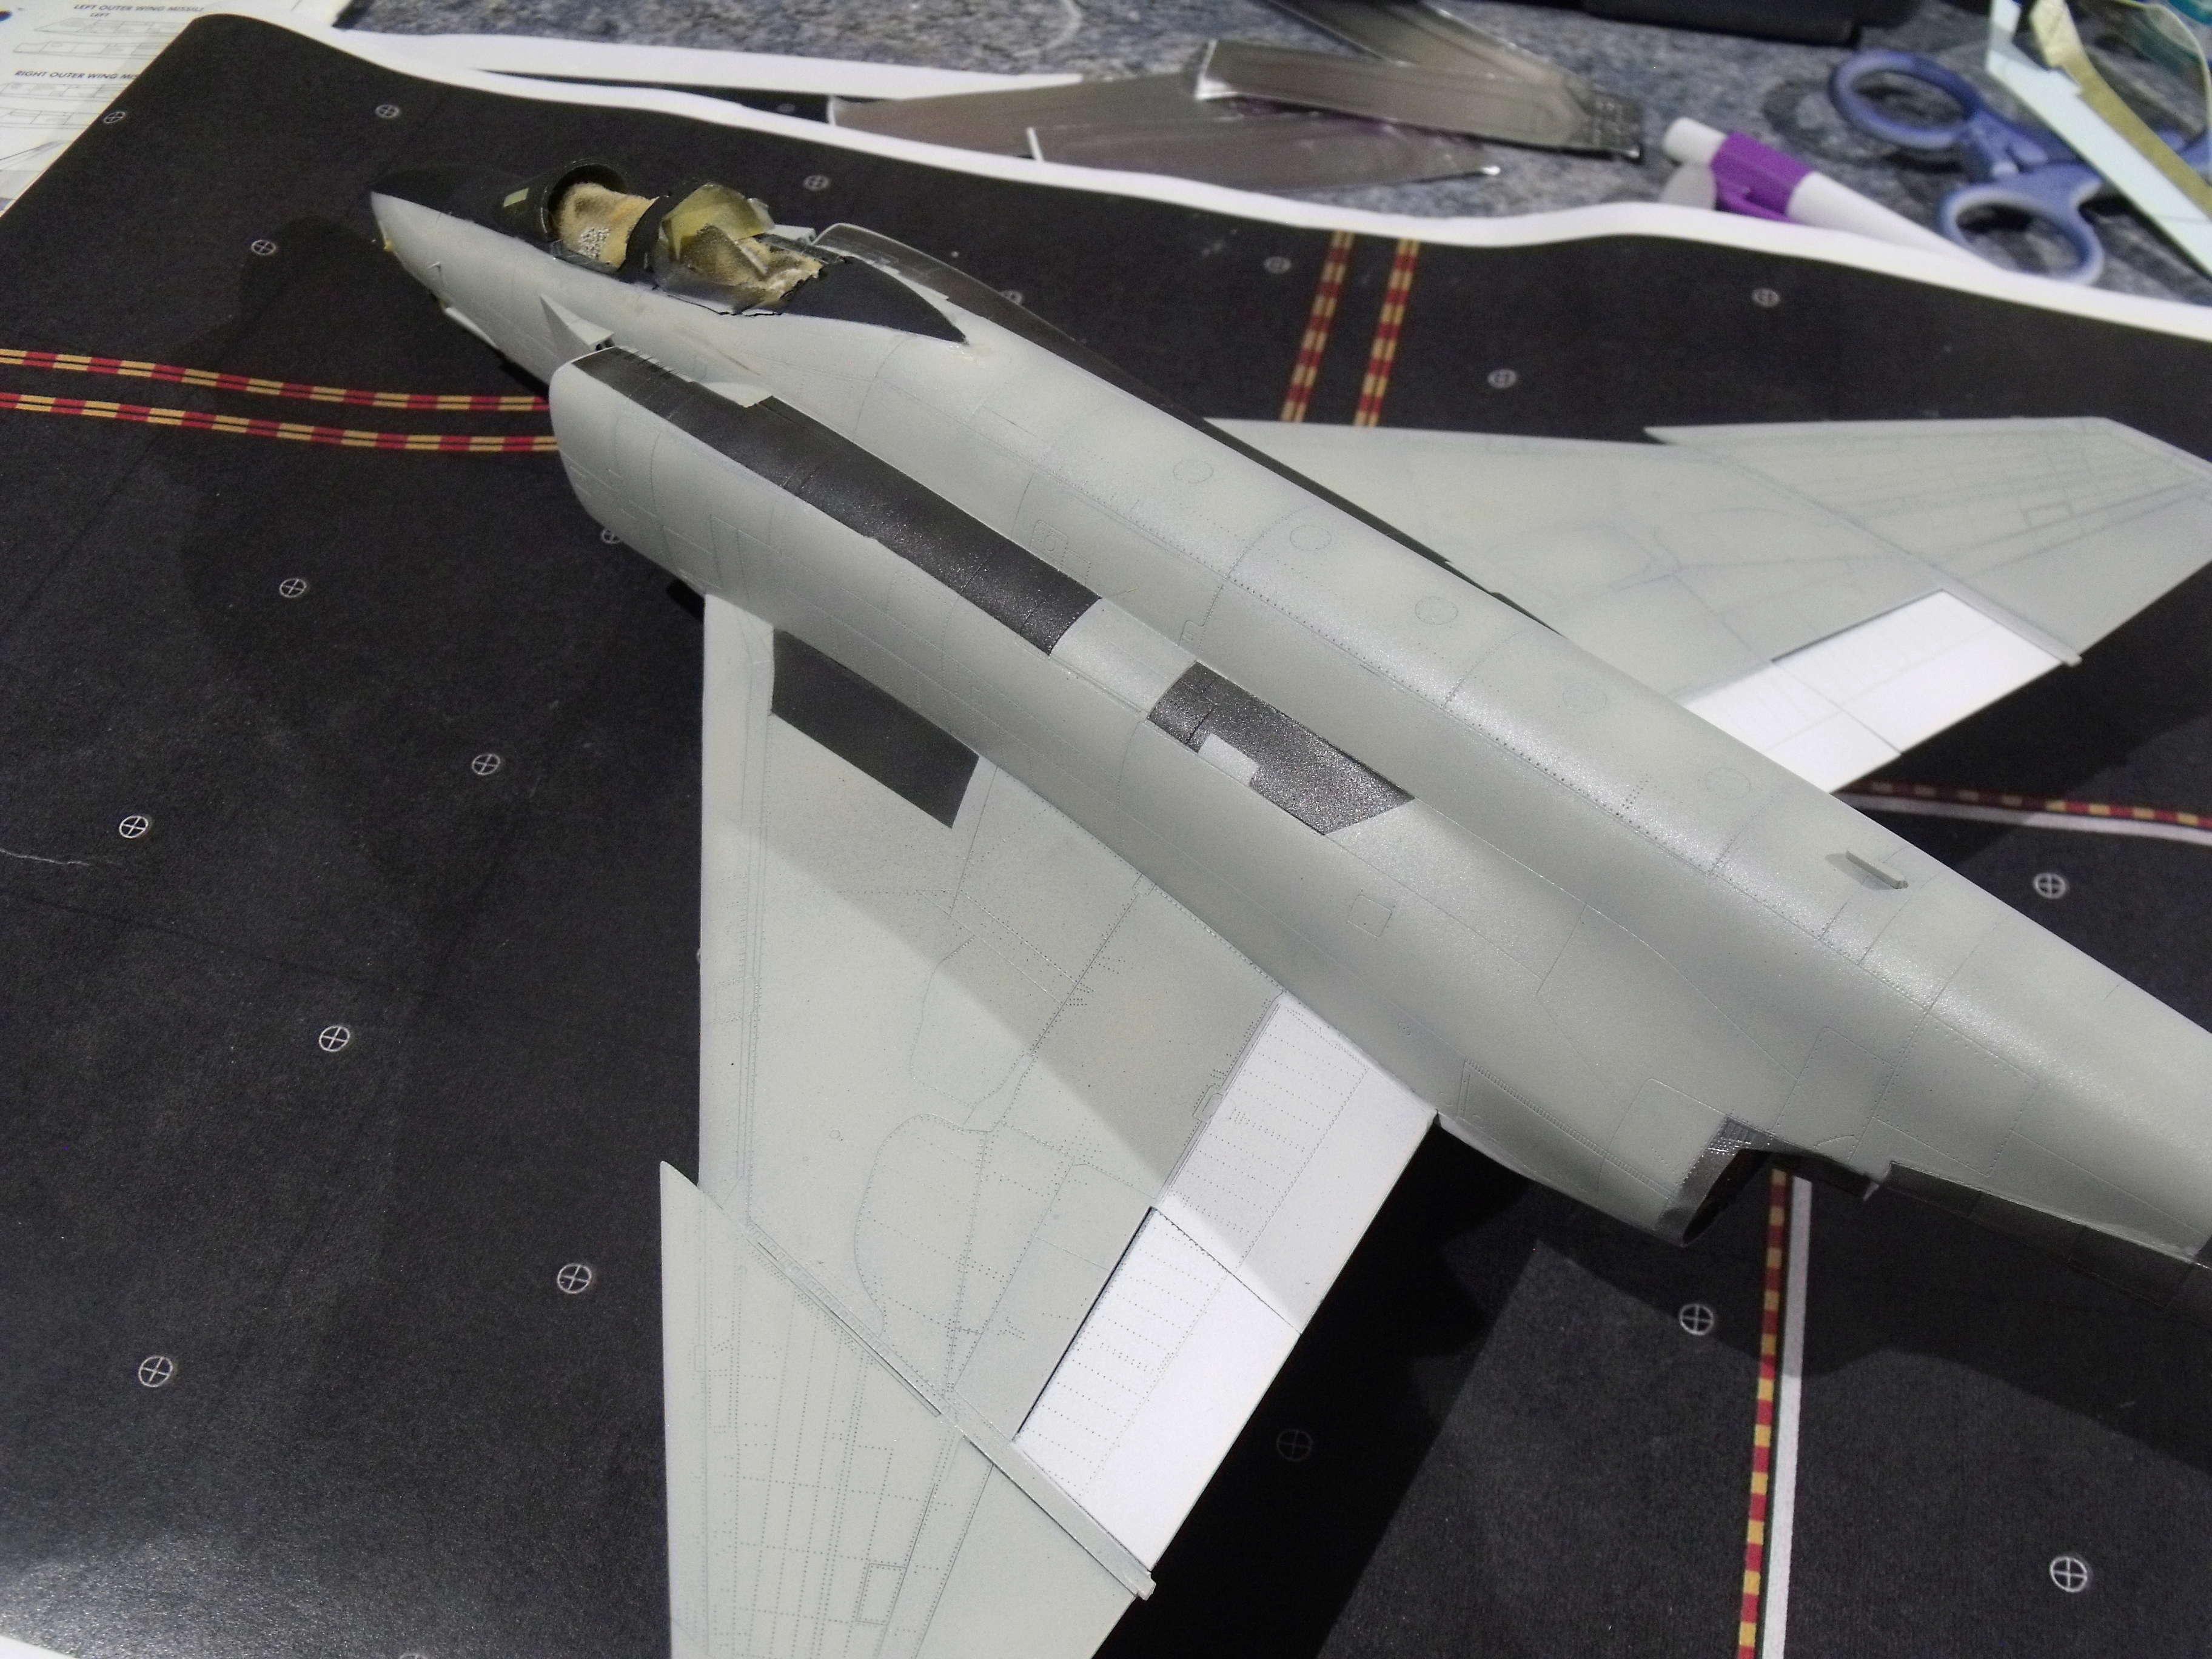 F-4 B Phantom 1/48° - VF-51 - 1972 - Début de patine. - Page 4 Dscf7140